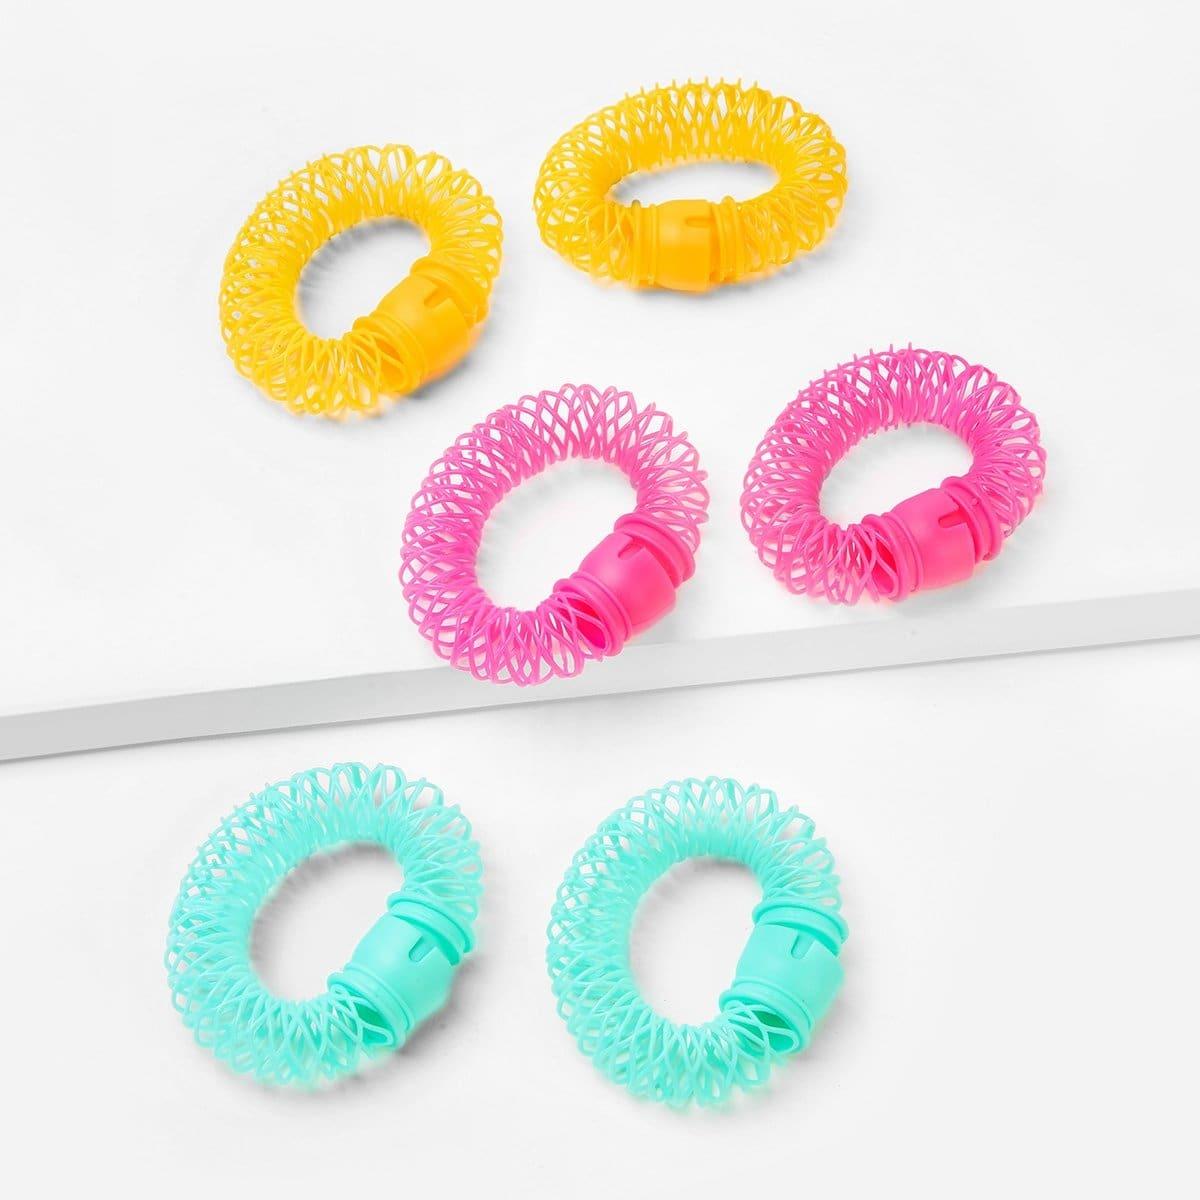 Donut Curly Hair Artifact 6st